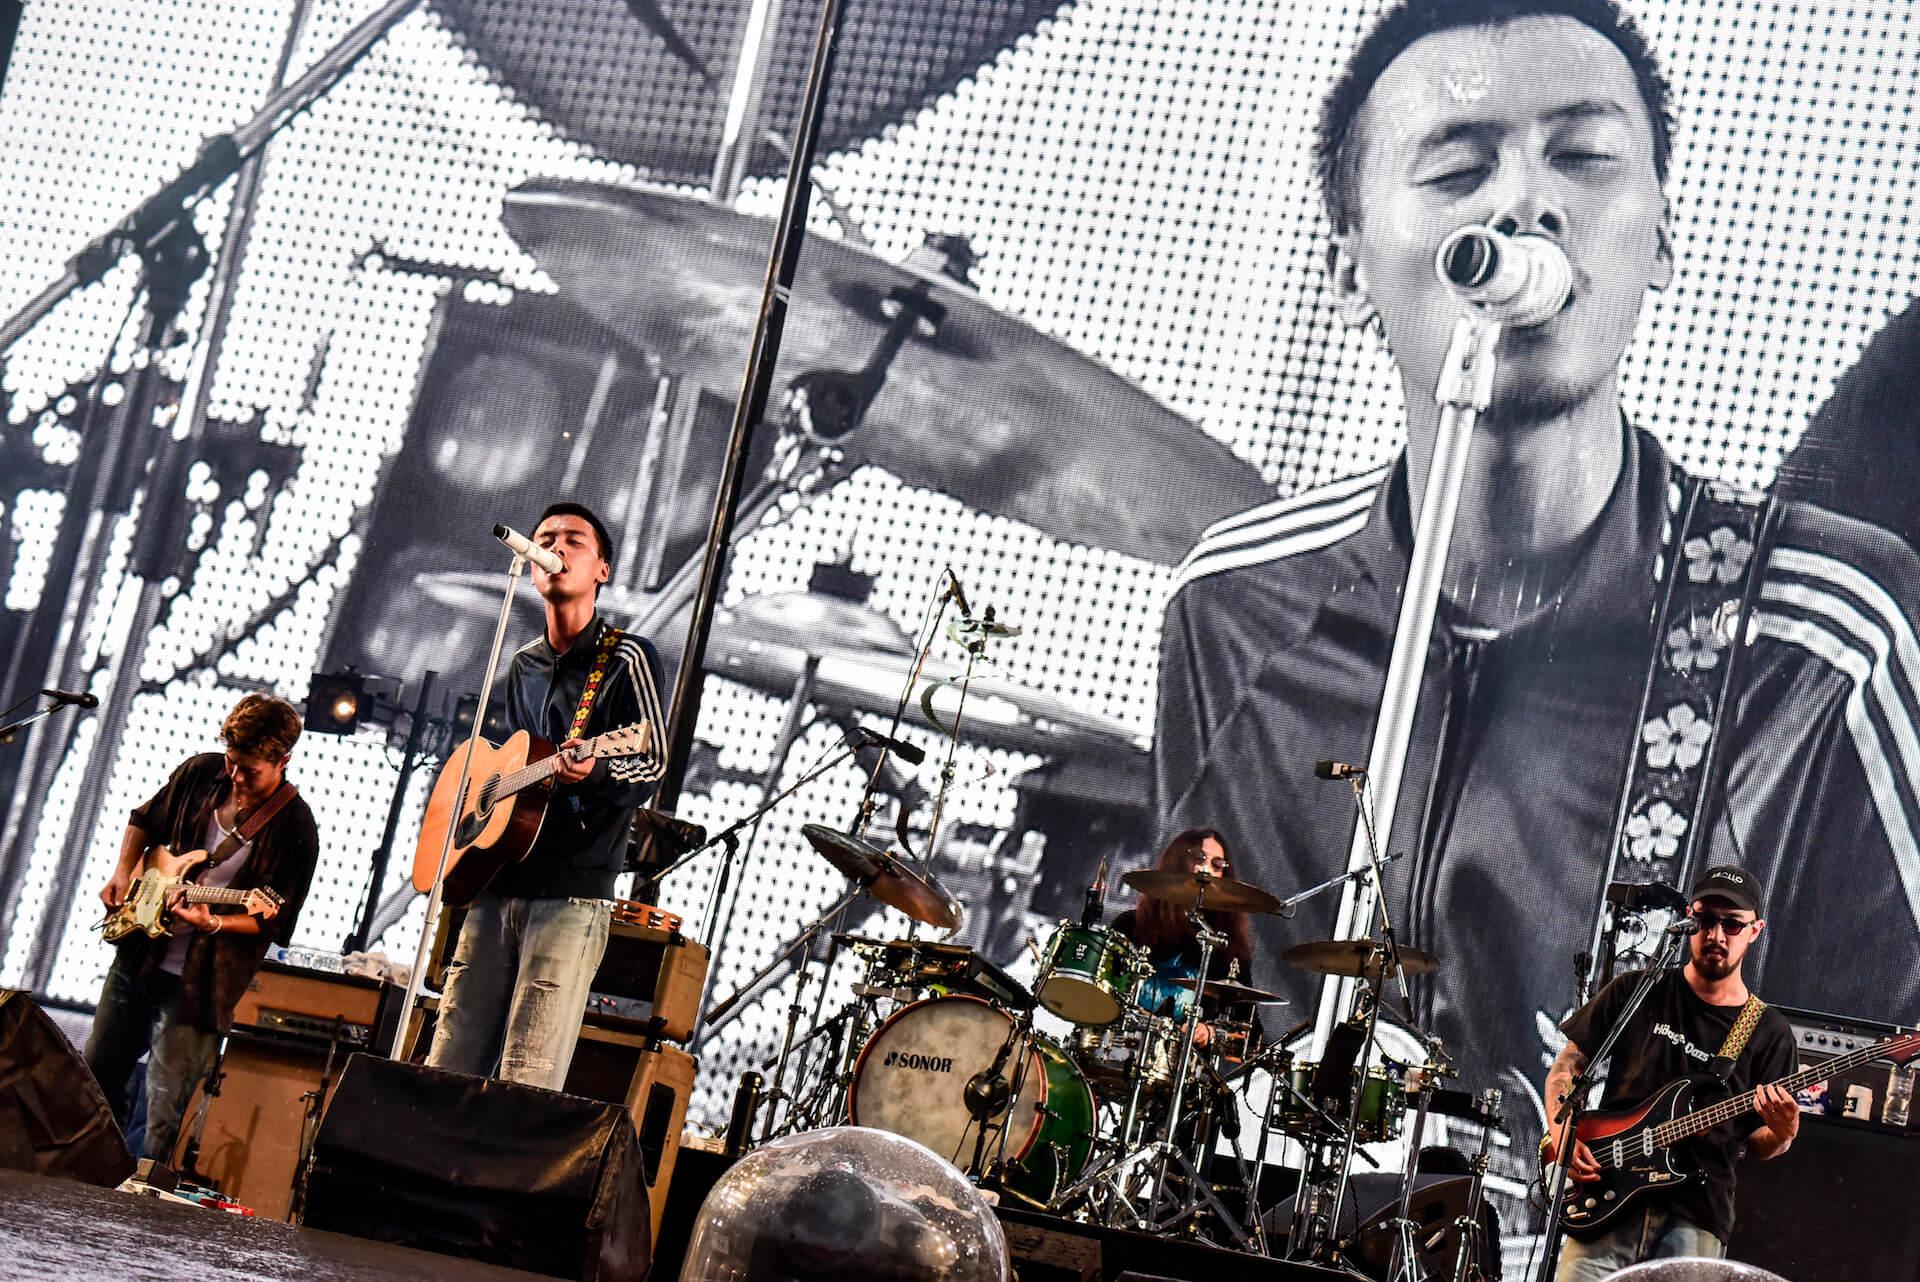 【Photo Documentary】Suchmos THE LIVE 横浜スタジアム b01ca9481f9927e54c4aa6d88624a2e7